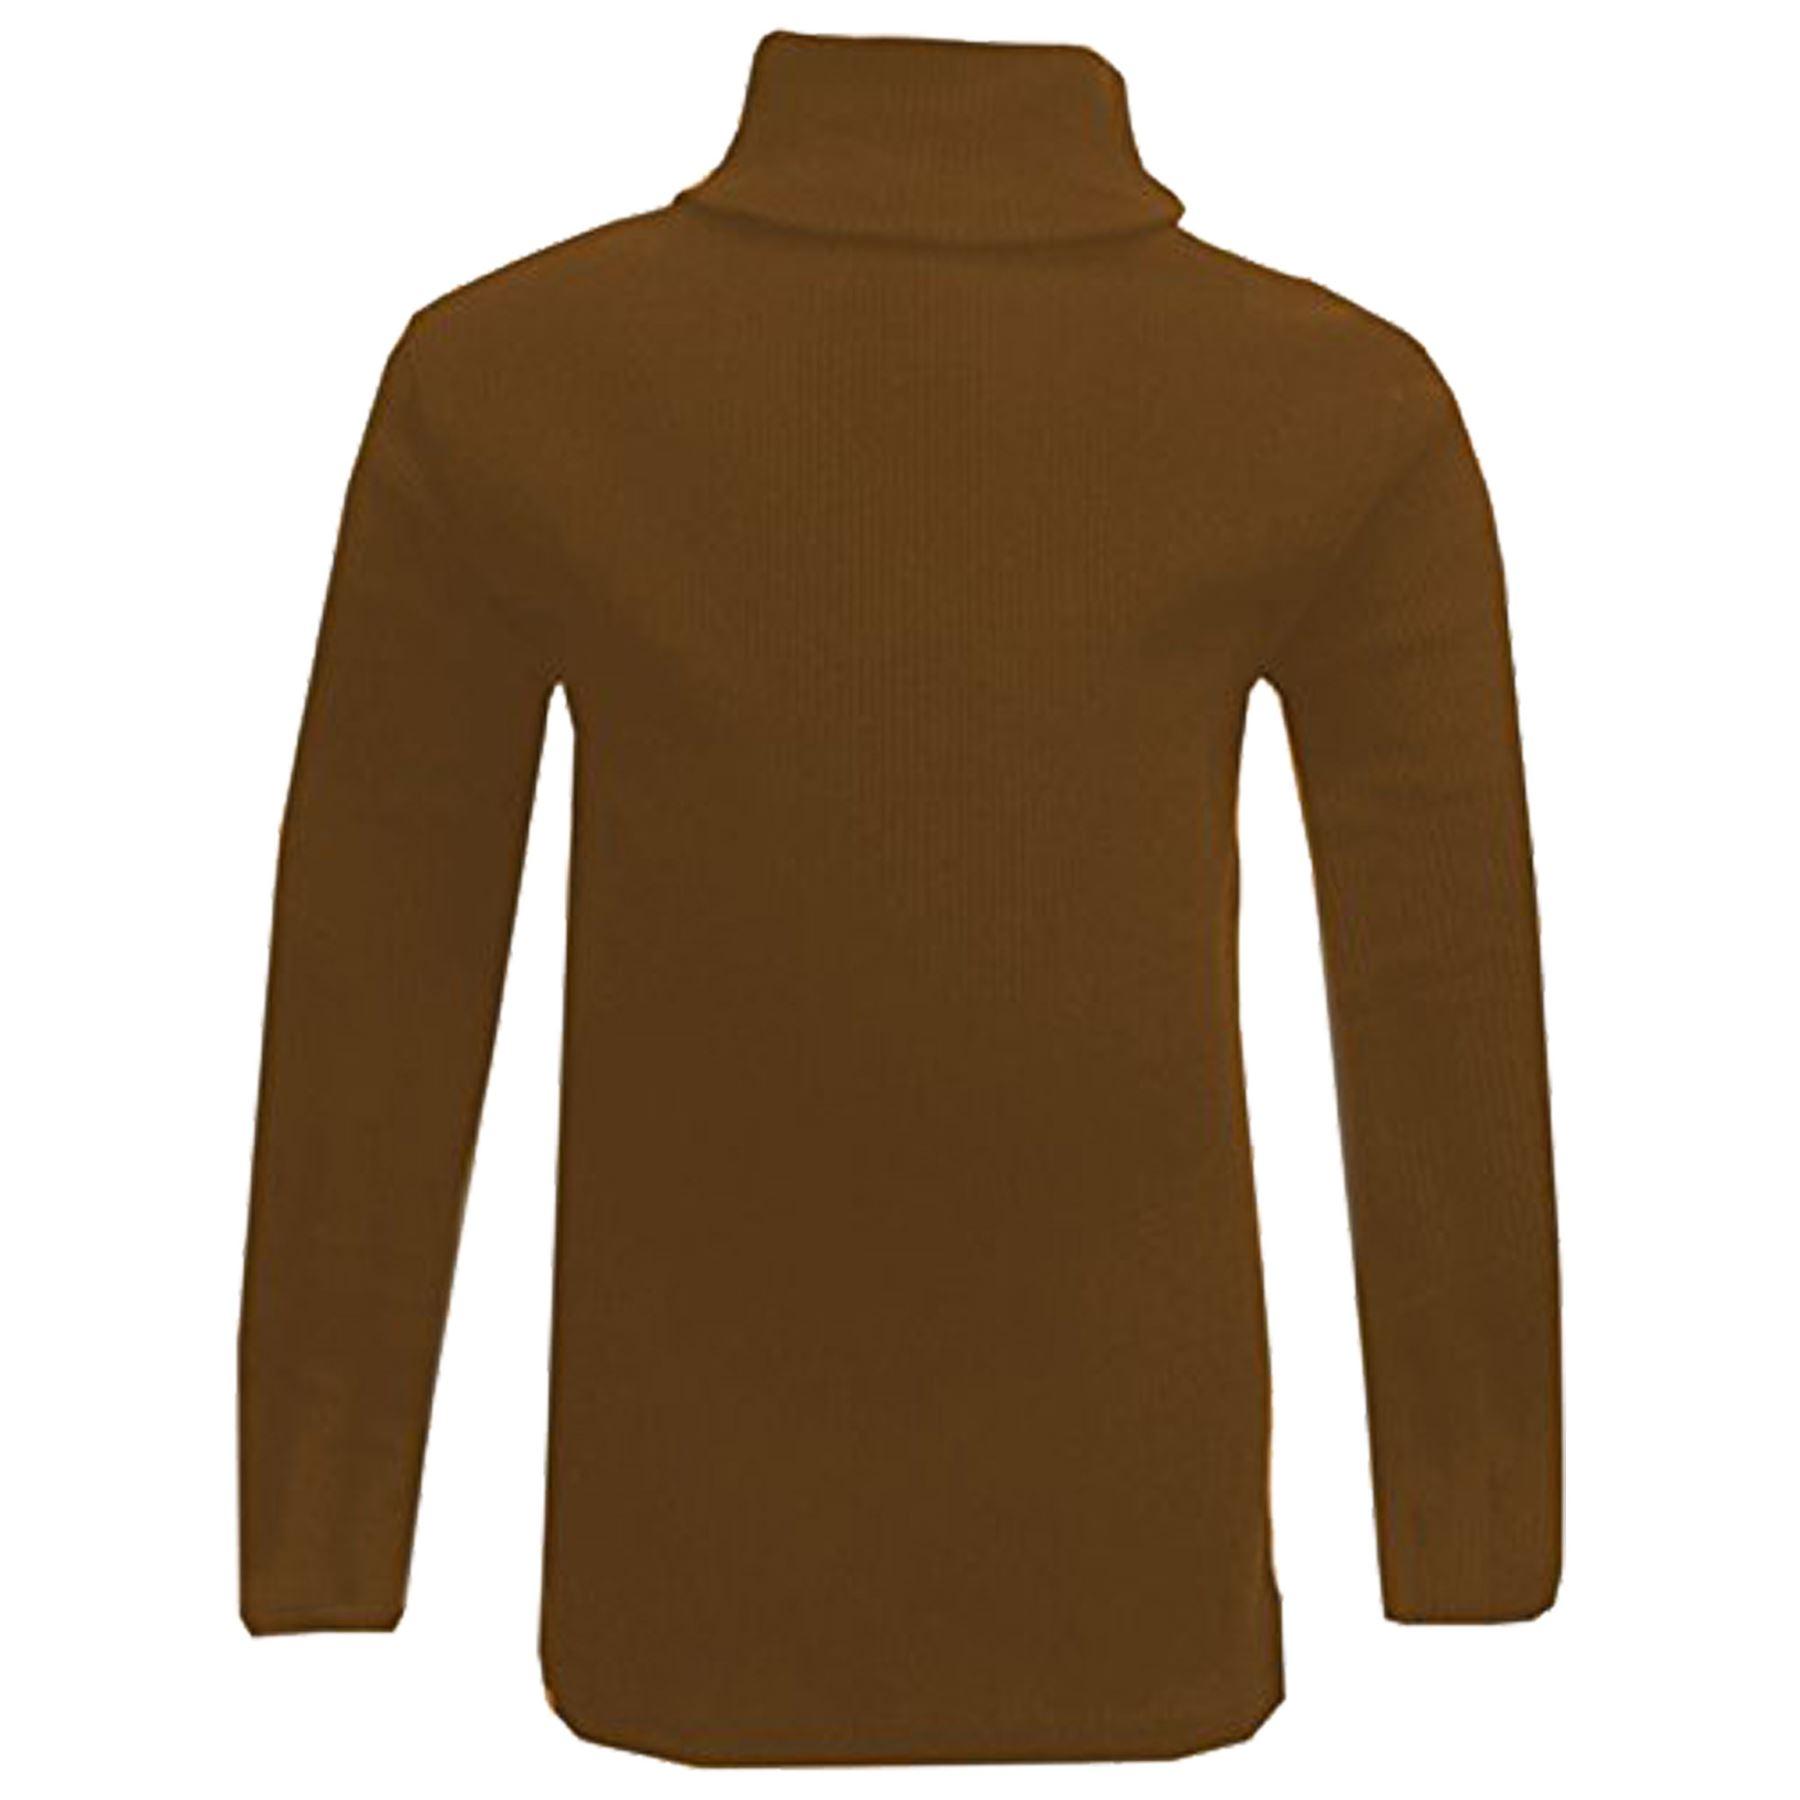 kids girls polo neck t shirt ribbed cotton jumper long